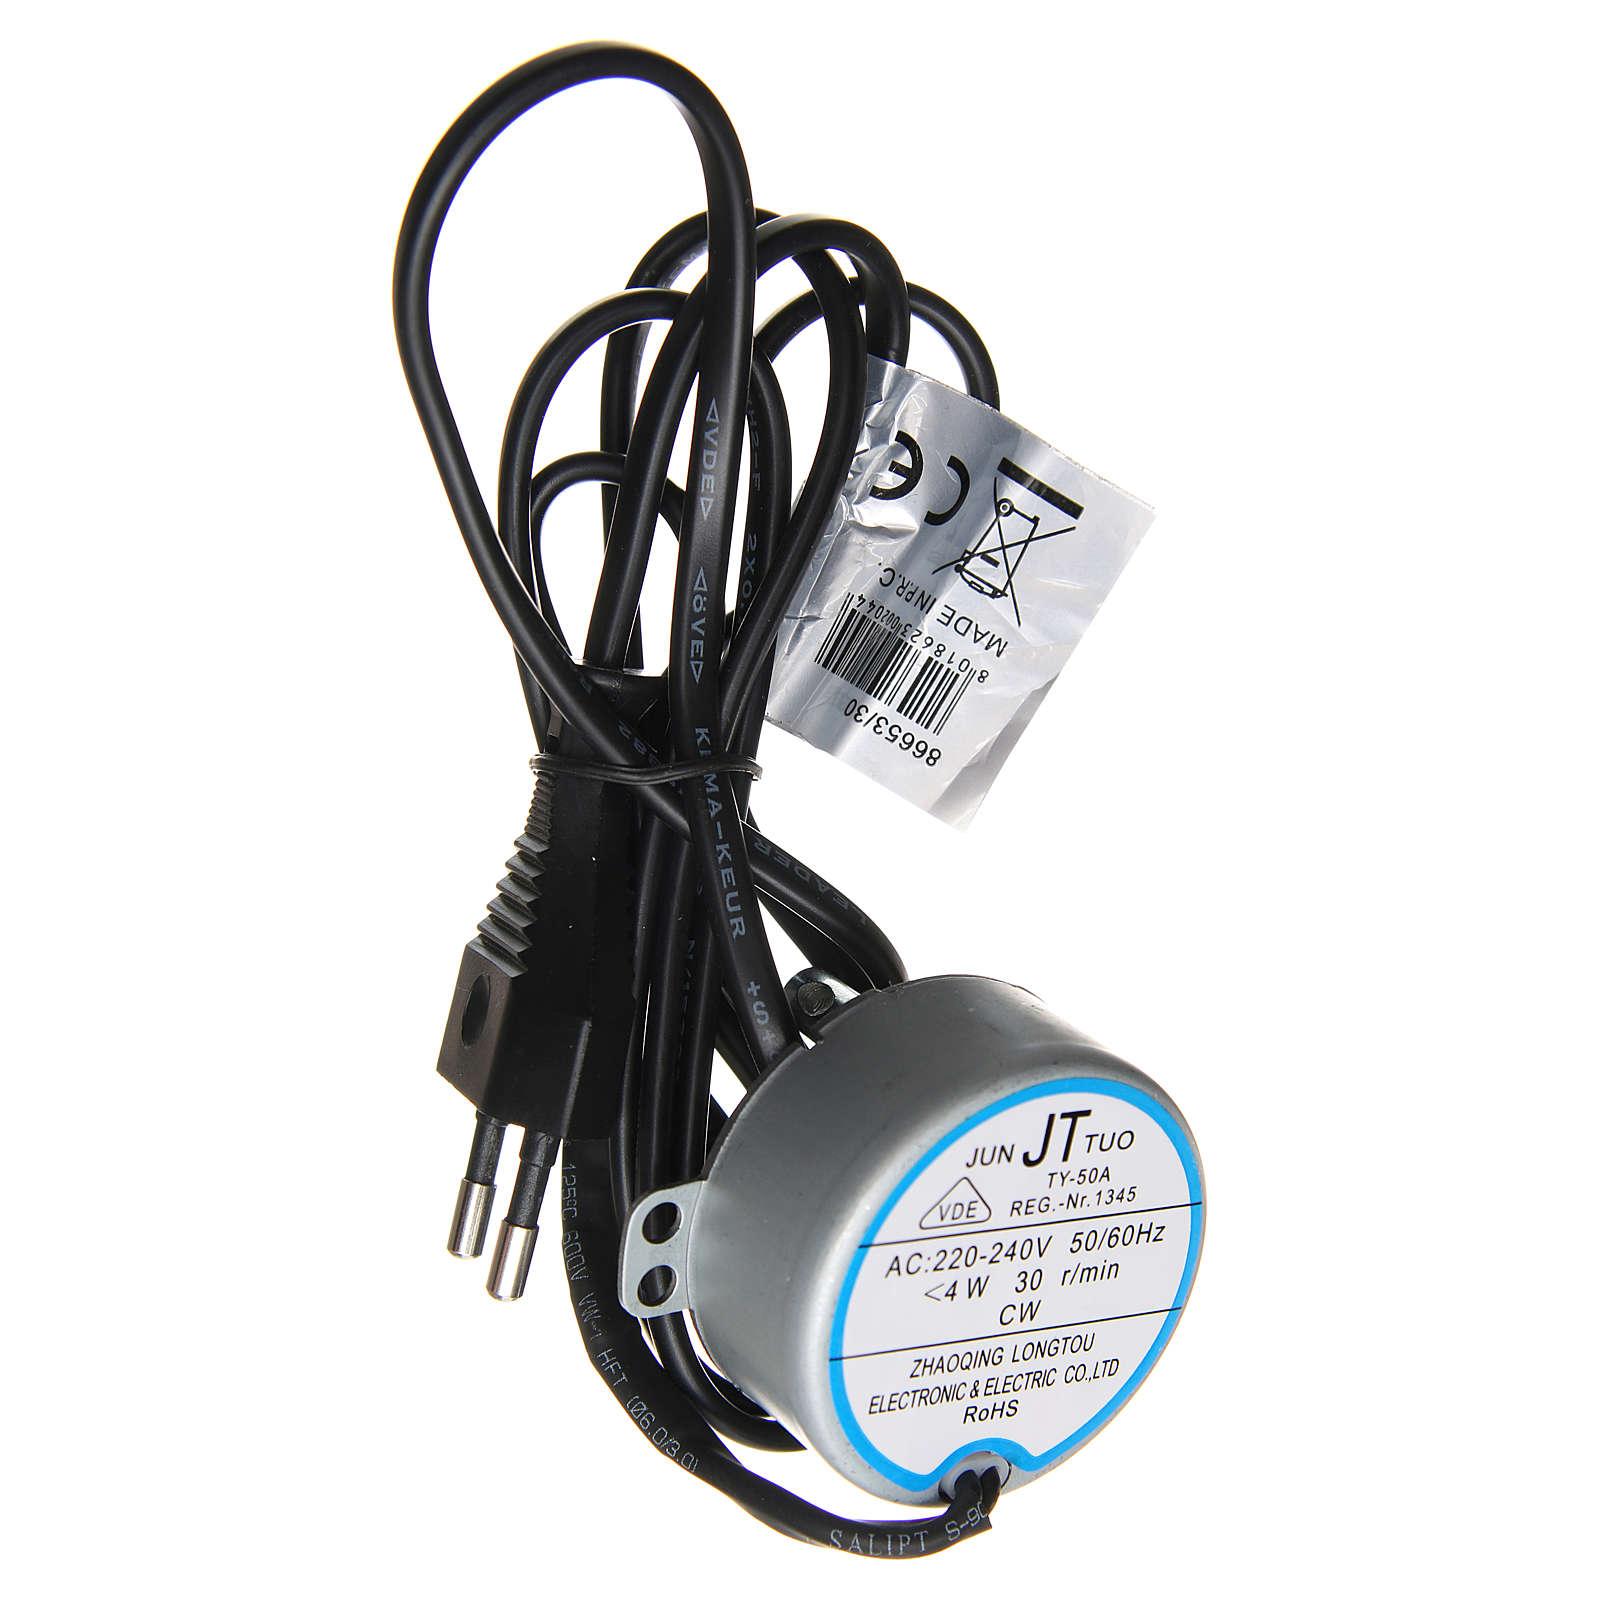 Motoriduttore presepe movimenti 4 watt 30 giri/min 4